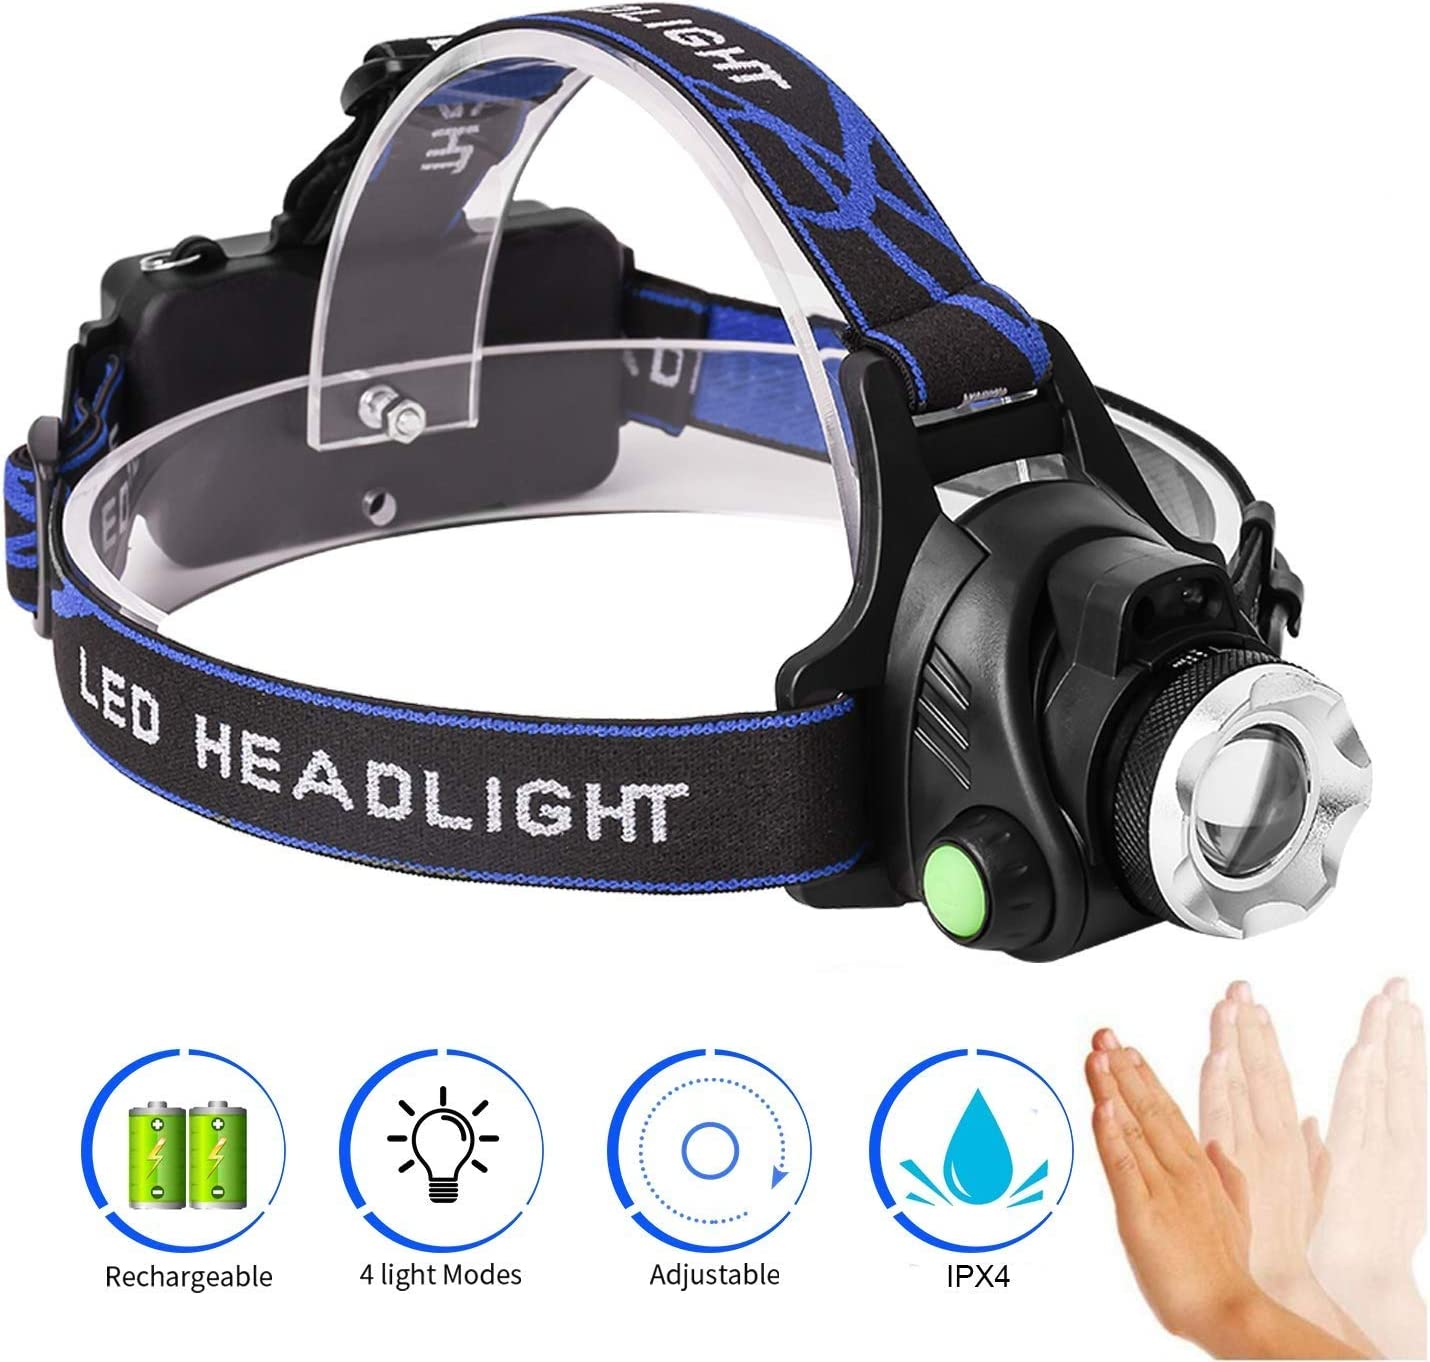 12 COB Outdoor Led Headlight Camping Riding Lighting Head Lamp Flashlight Torch